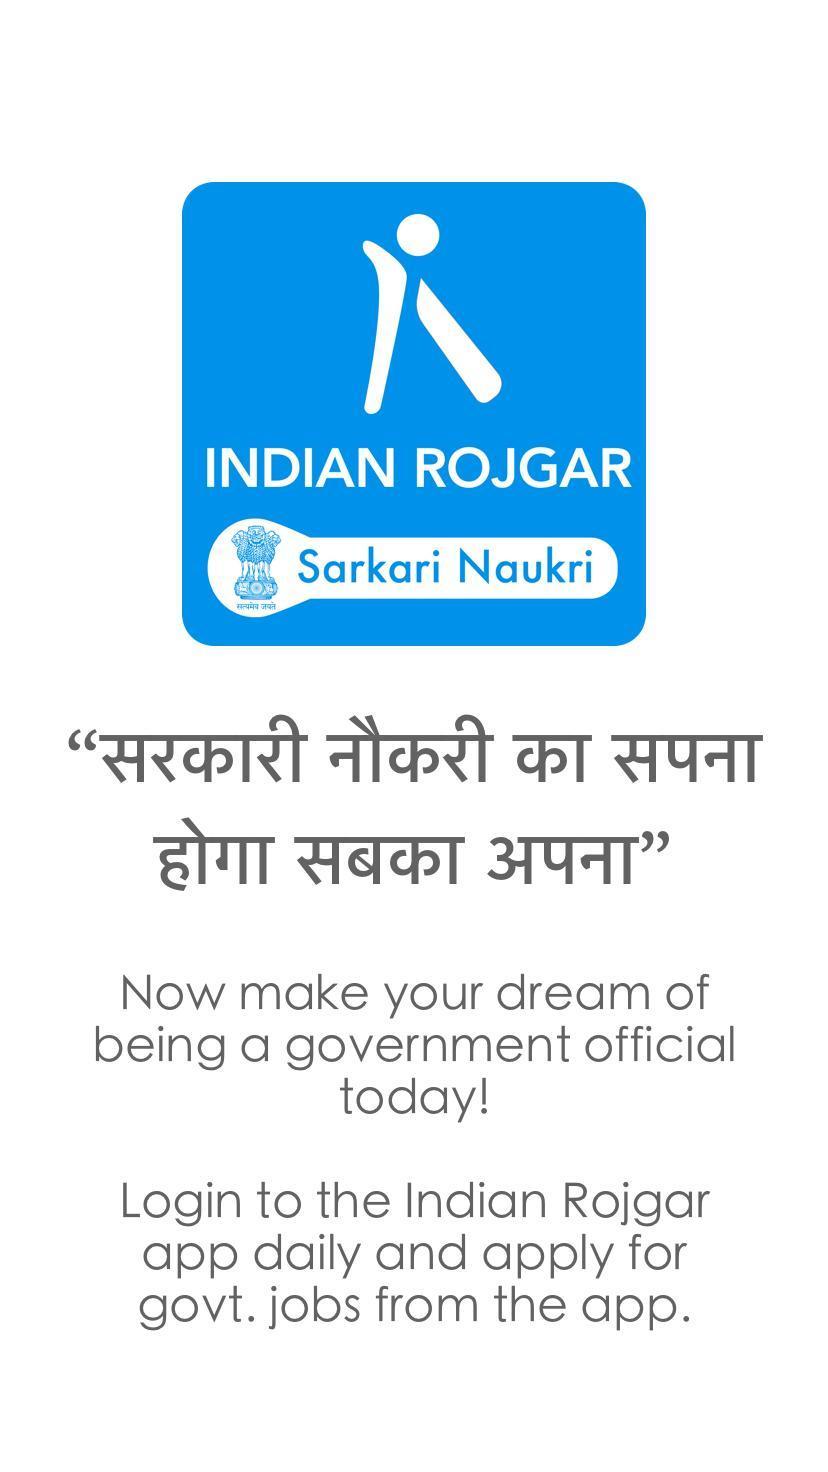 Sarkari Naukri for Android - APK Download